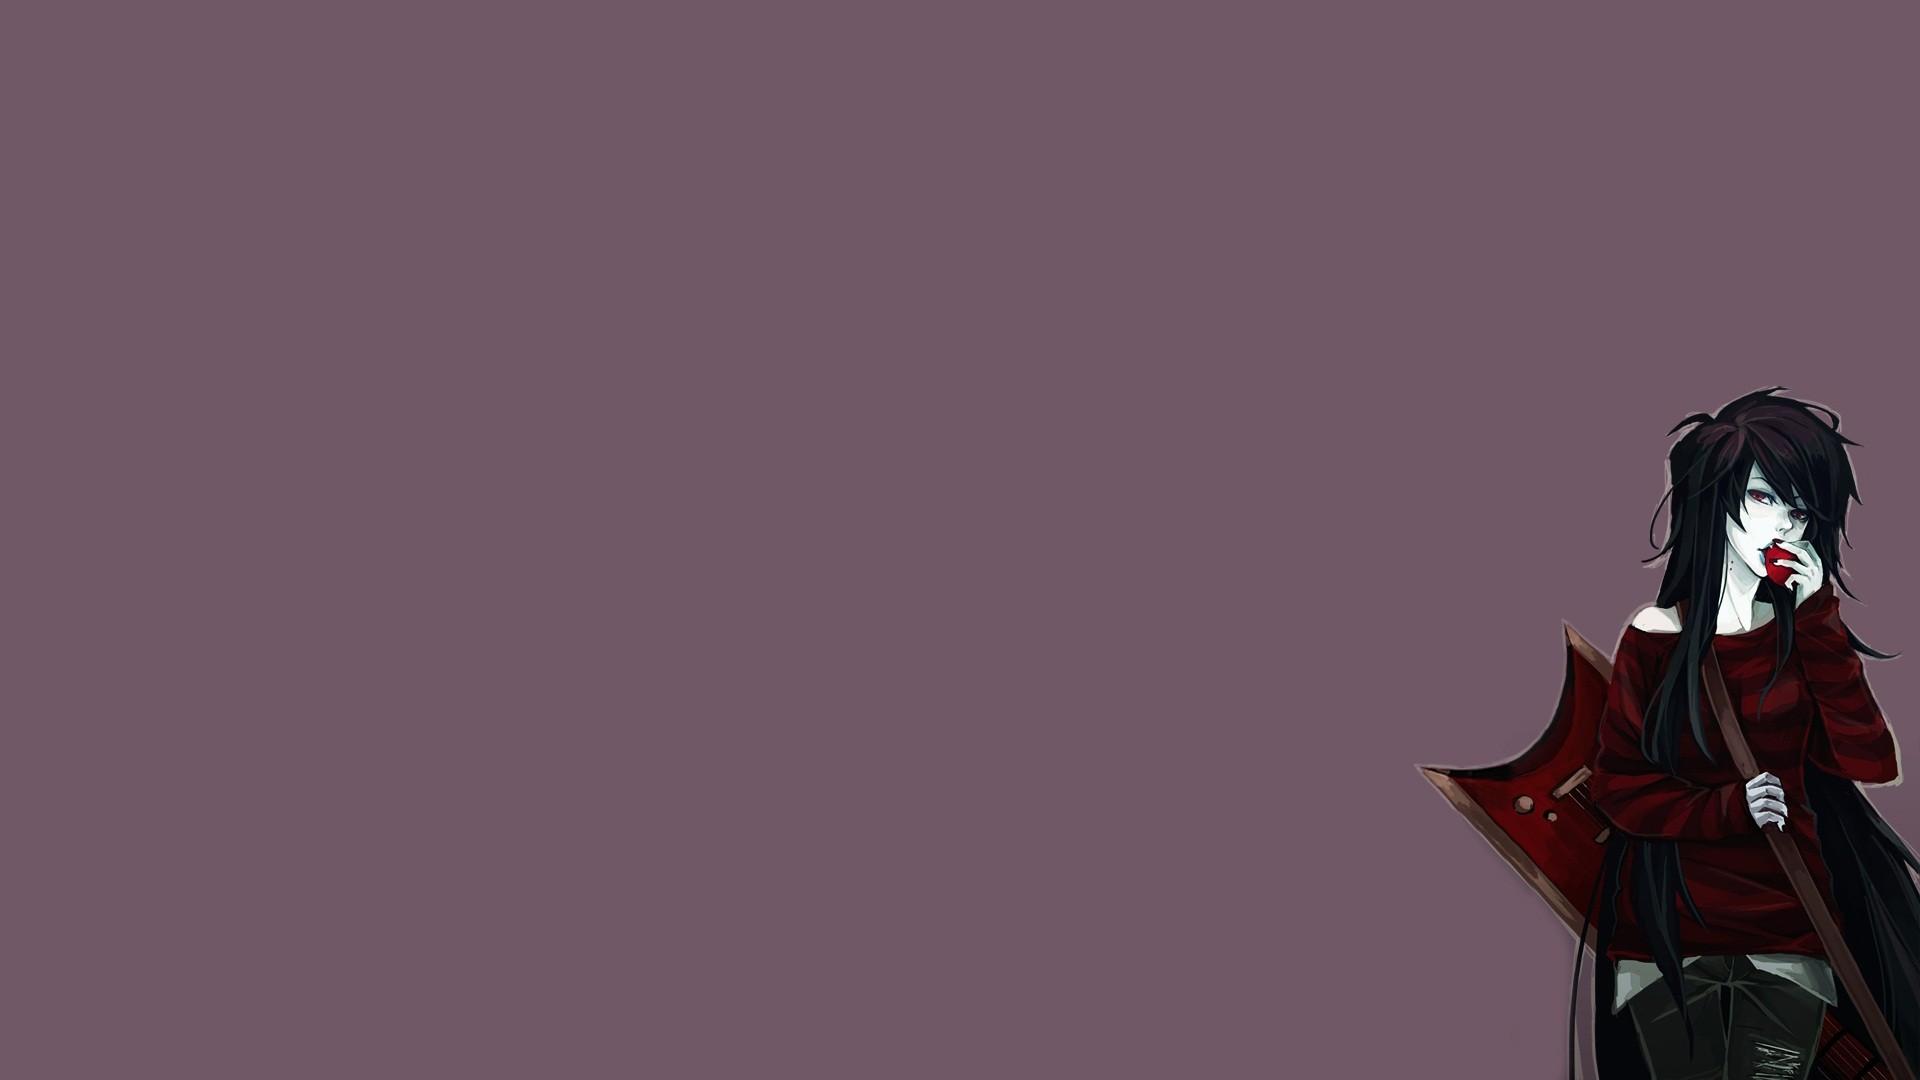 Anime Girls Minimalism Adventure Time Marceline The Vampire Queen Screenshot Computer Wallpaper